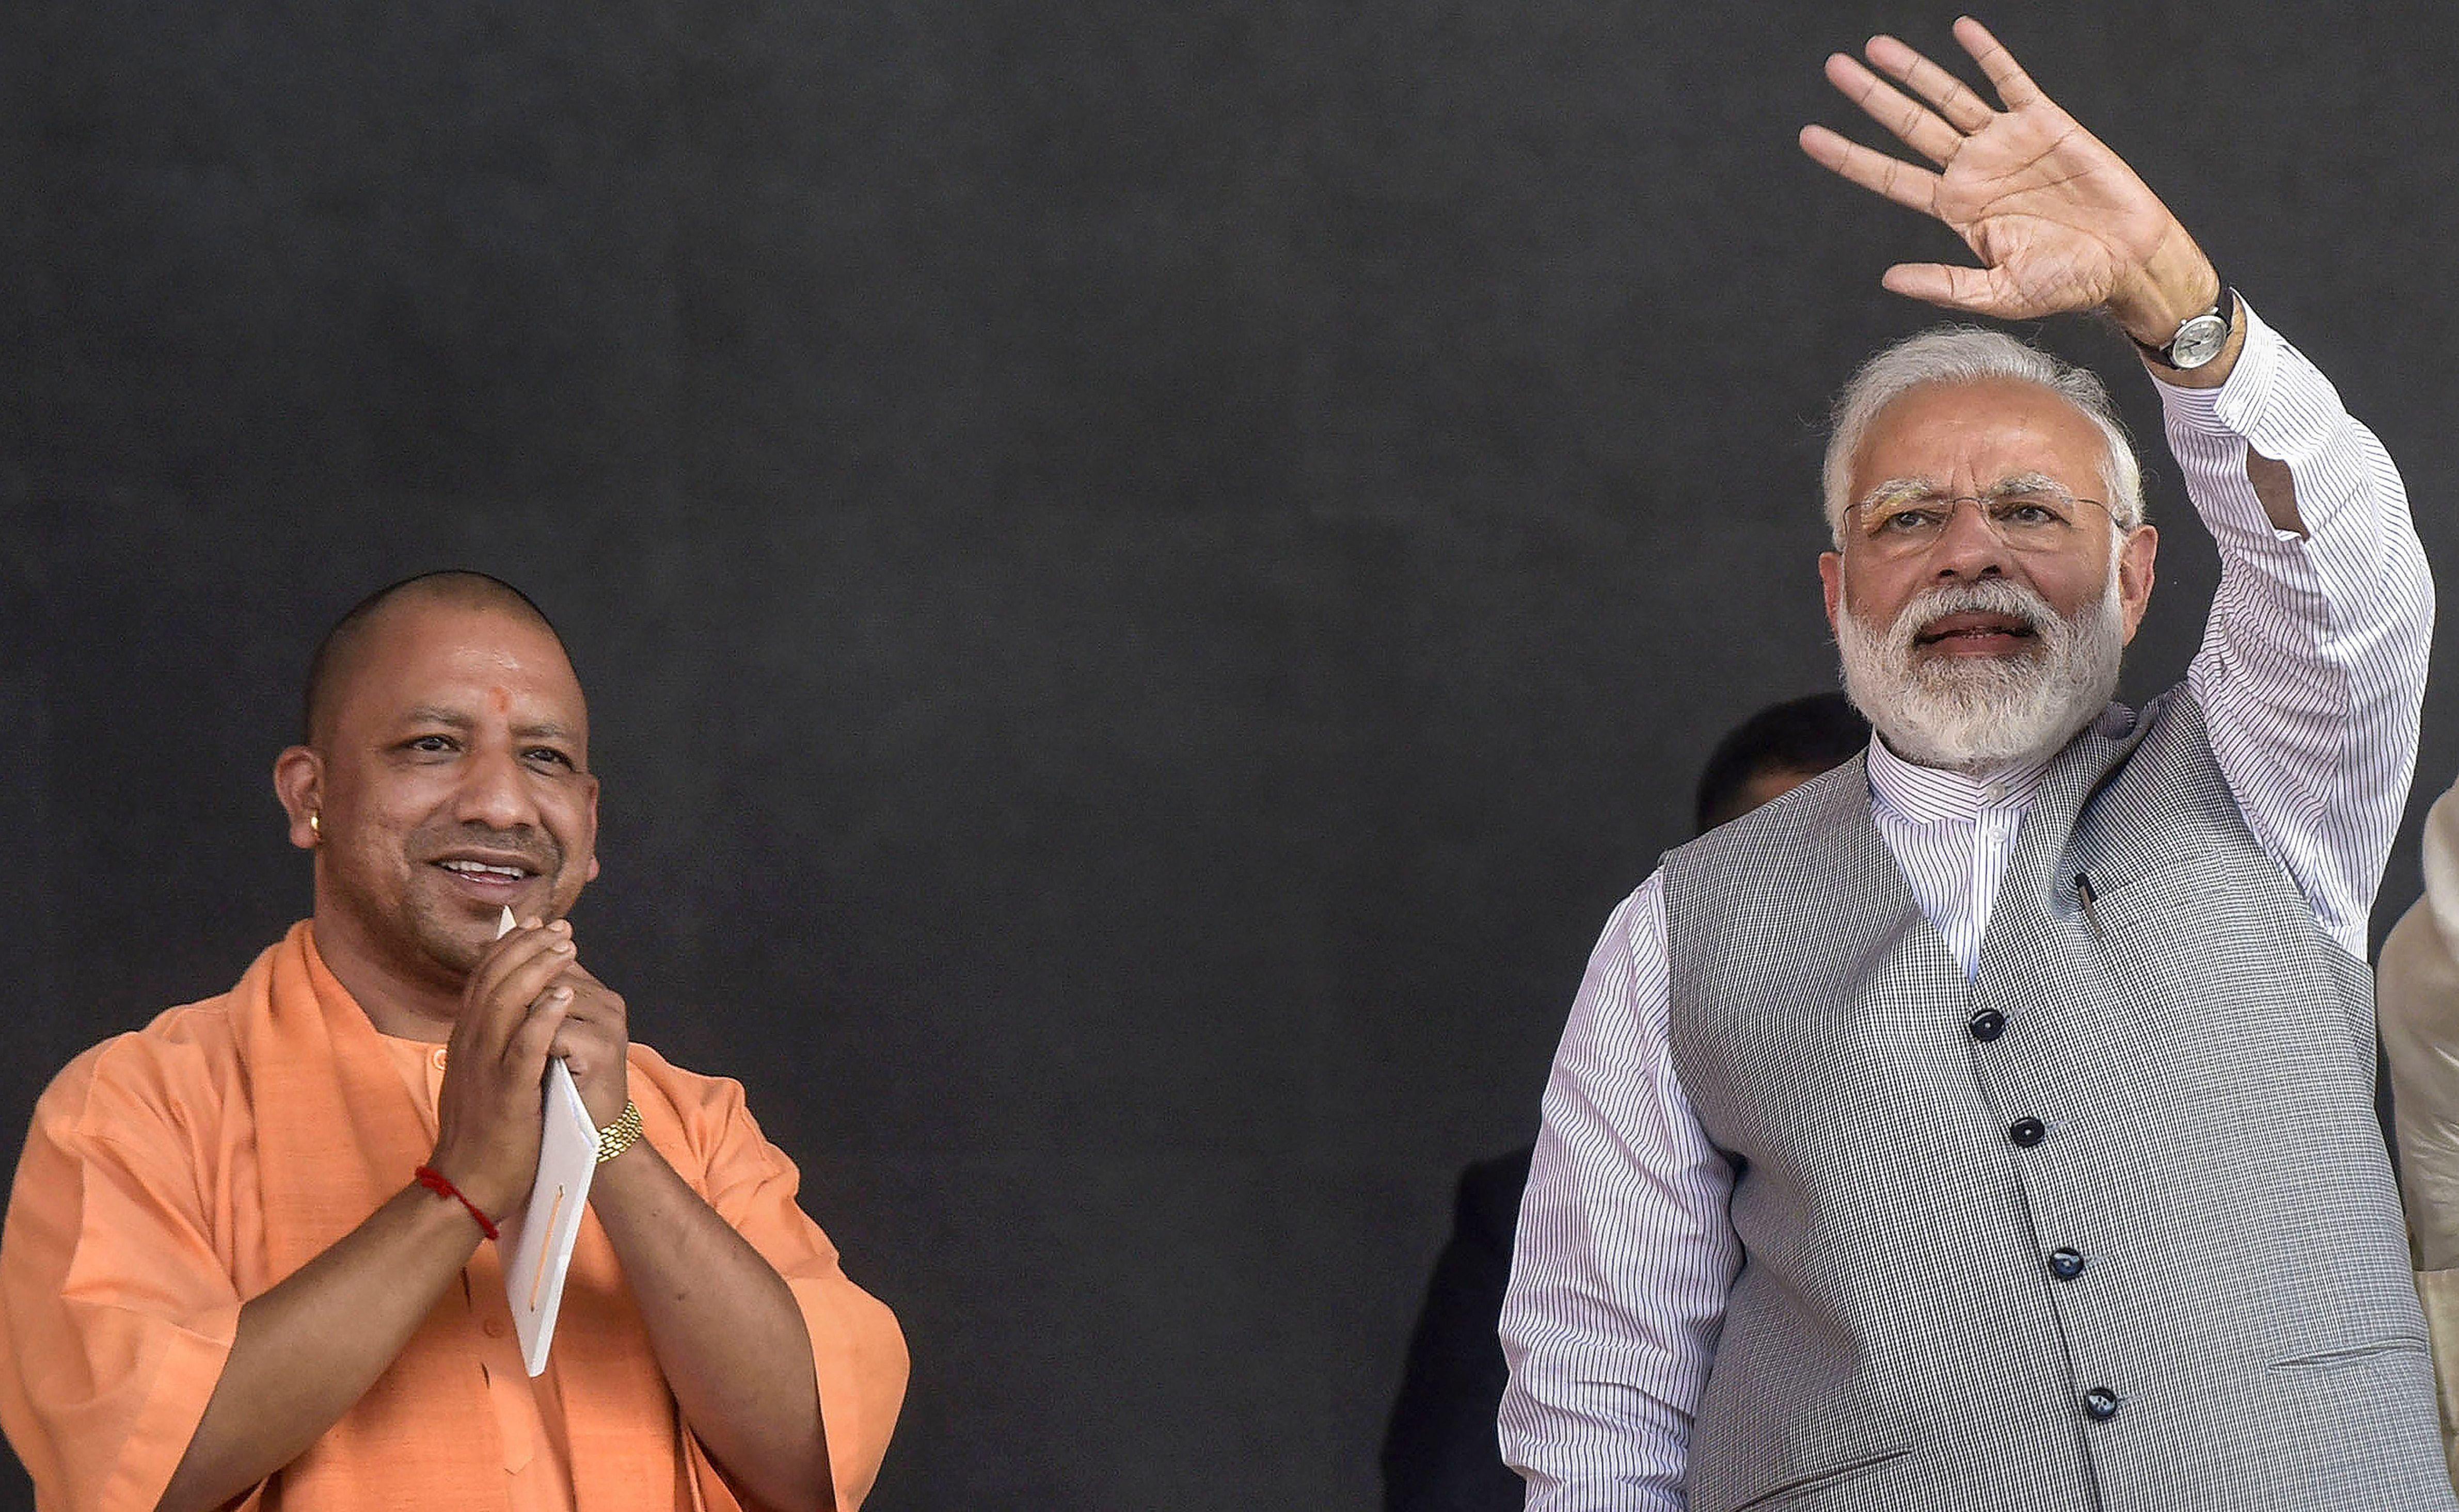 Uttar Pradesh chief minister Yogi Adityanath and Prime Minister Narendra Modi in Greater Noida on March 9, 2019